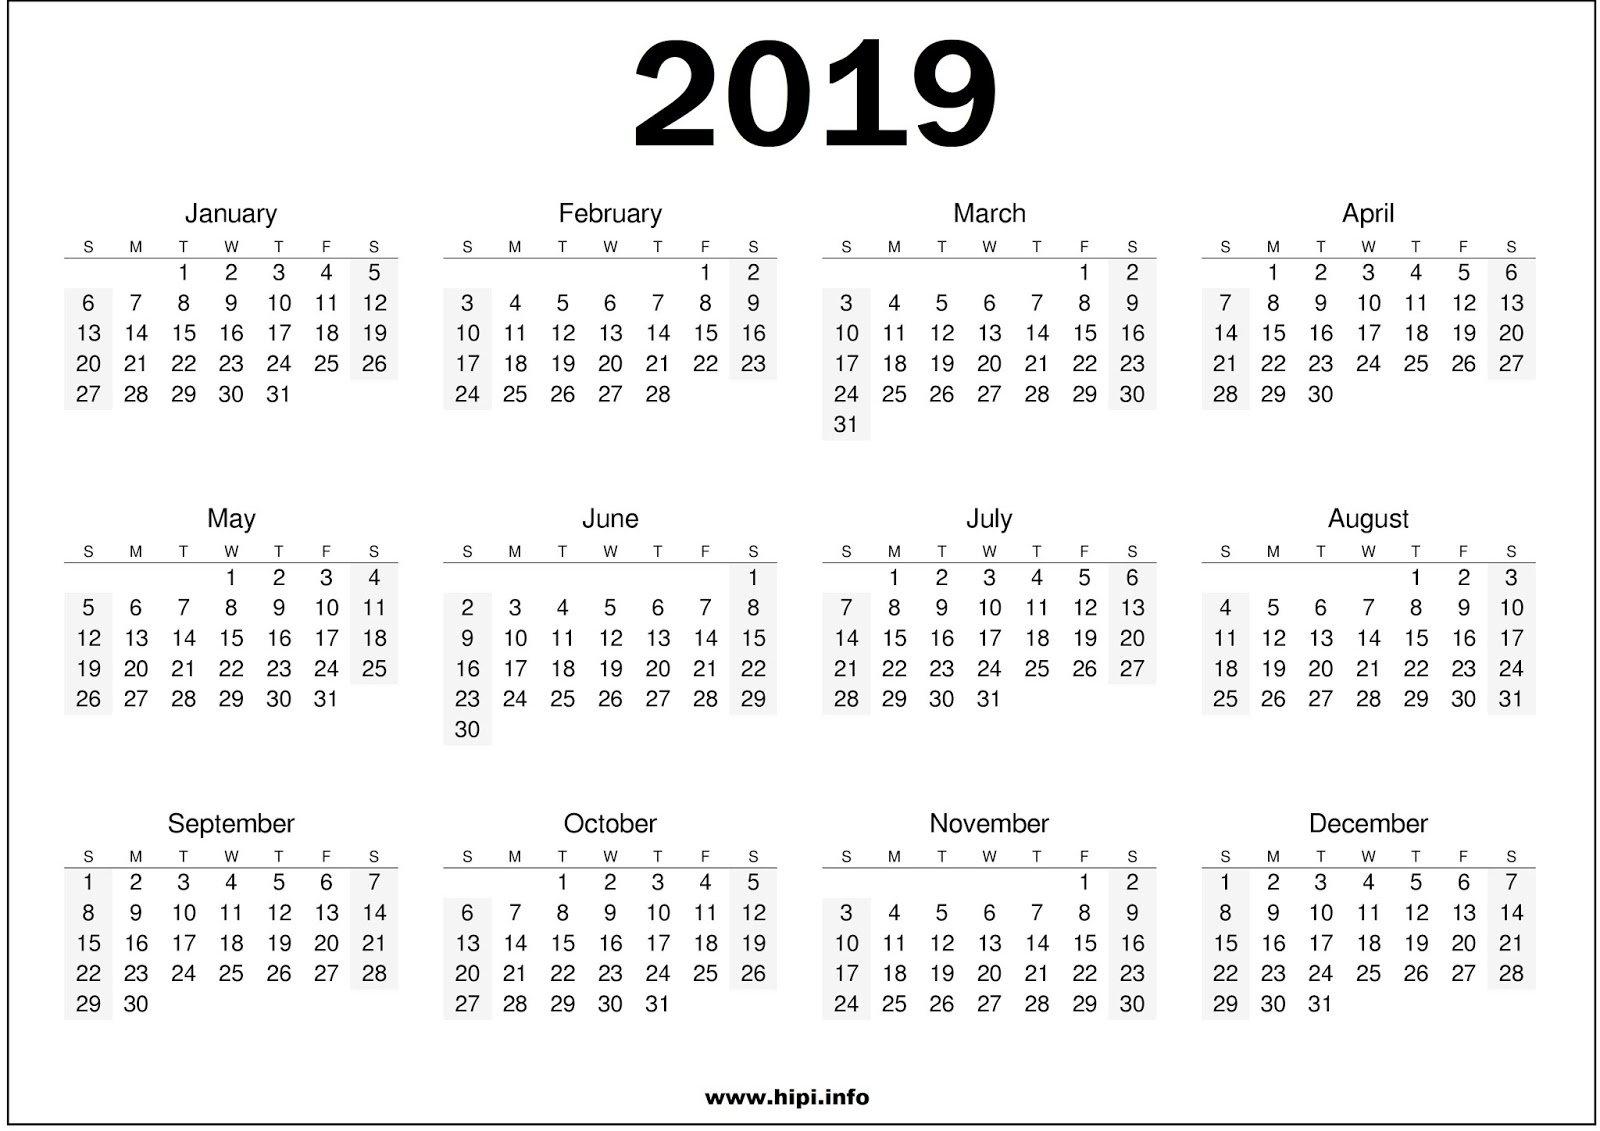 2019-Calendar-Printable-Free007 - Addicted2Adventure Calendar 2019 Za